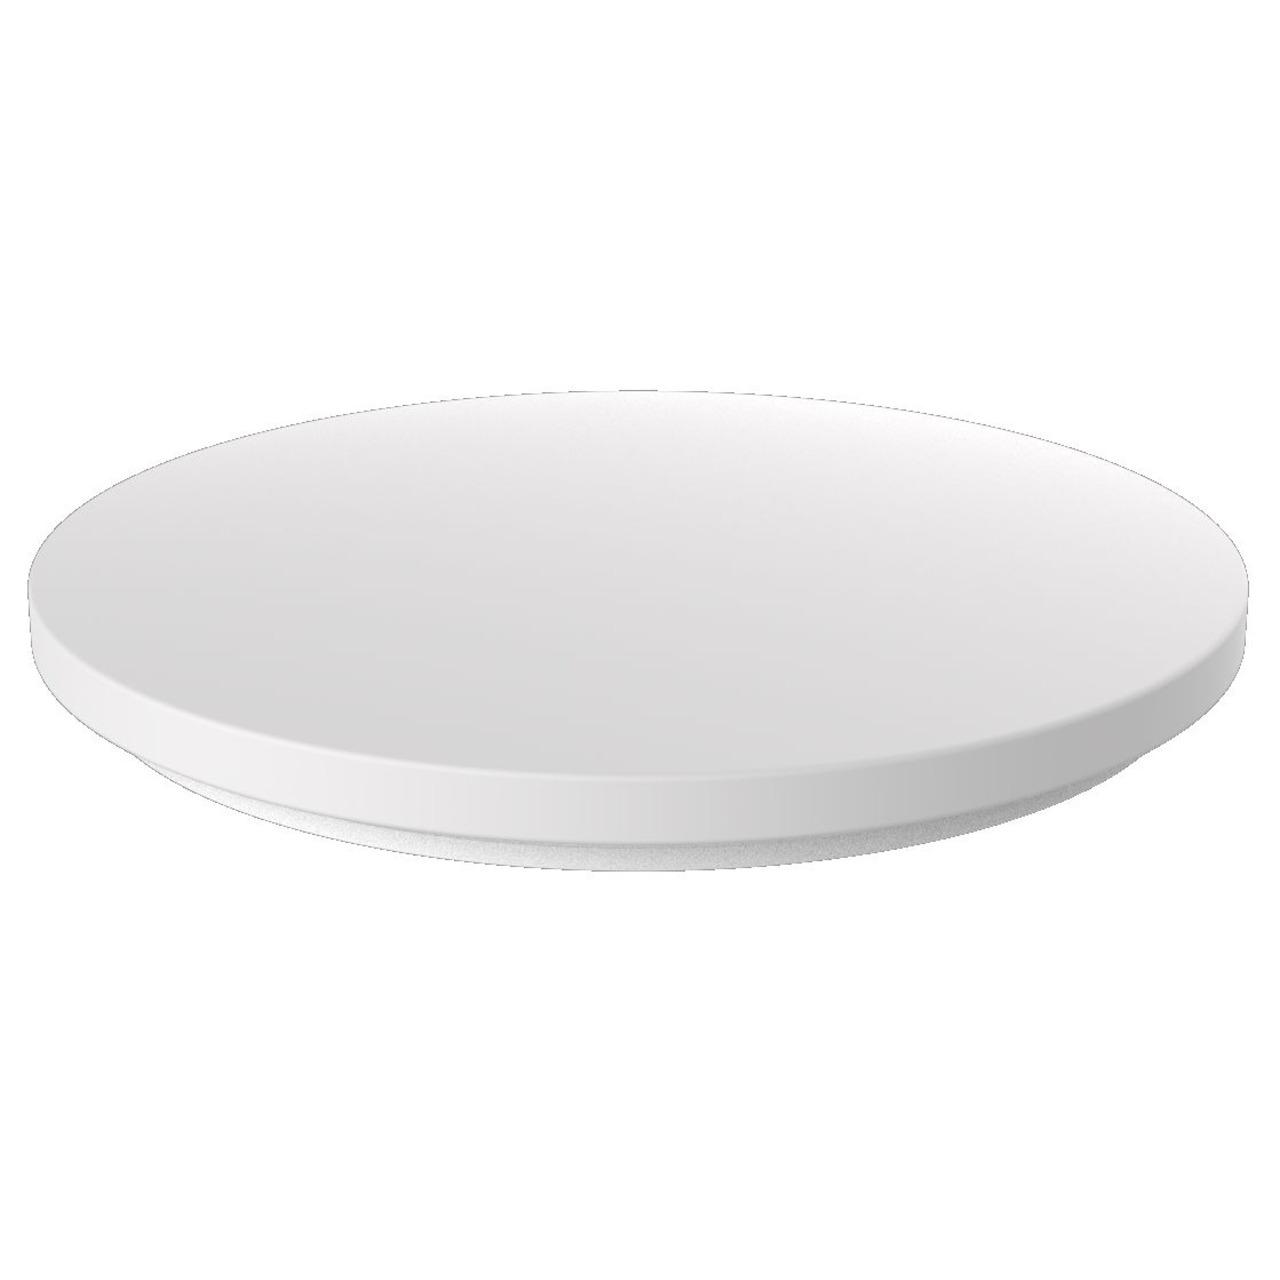 Blulaxa 24-W-LED-Wand-Deckenleuchte Aina-L mit Dimmfunktion- 2000 lm- neutralweiss (4000 K)